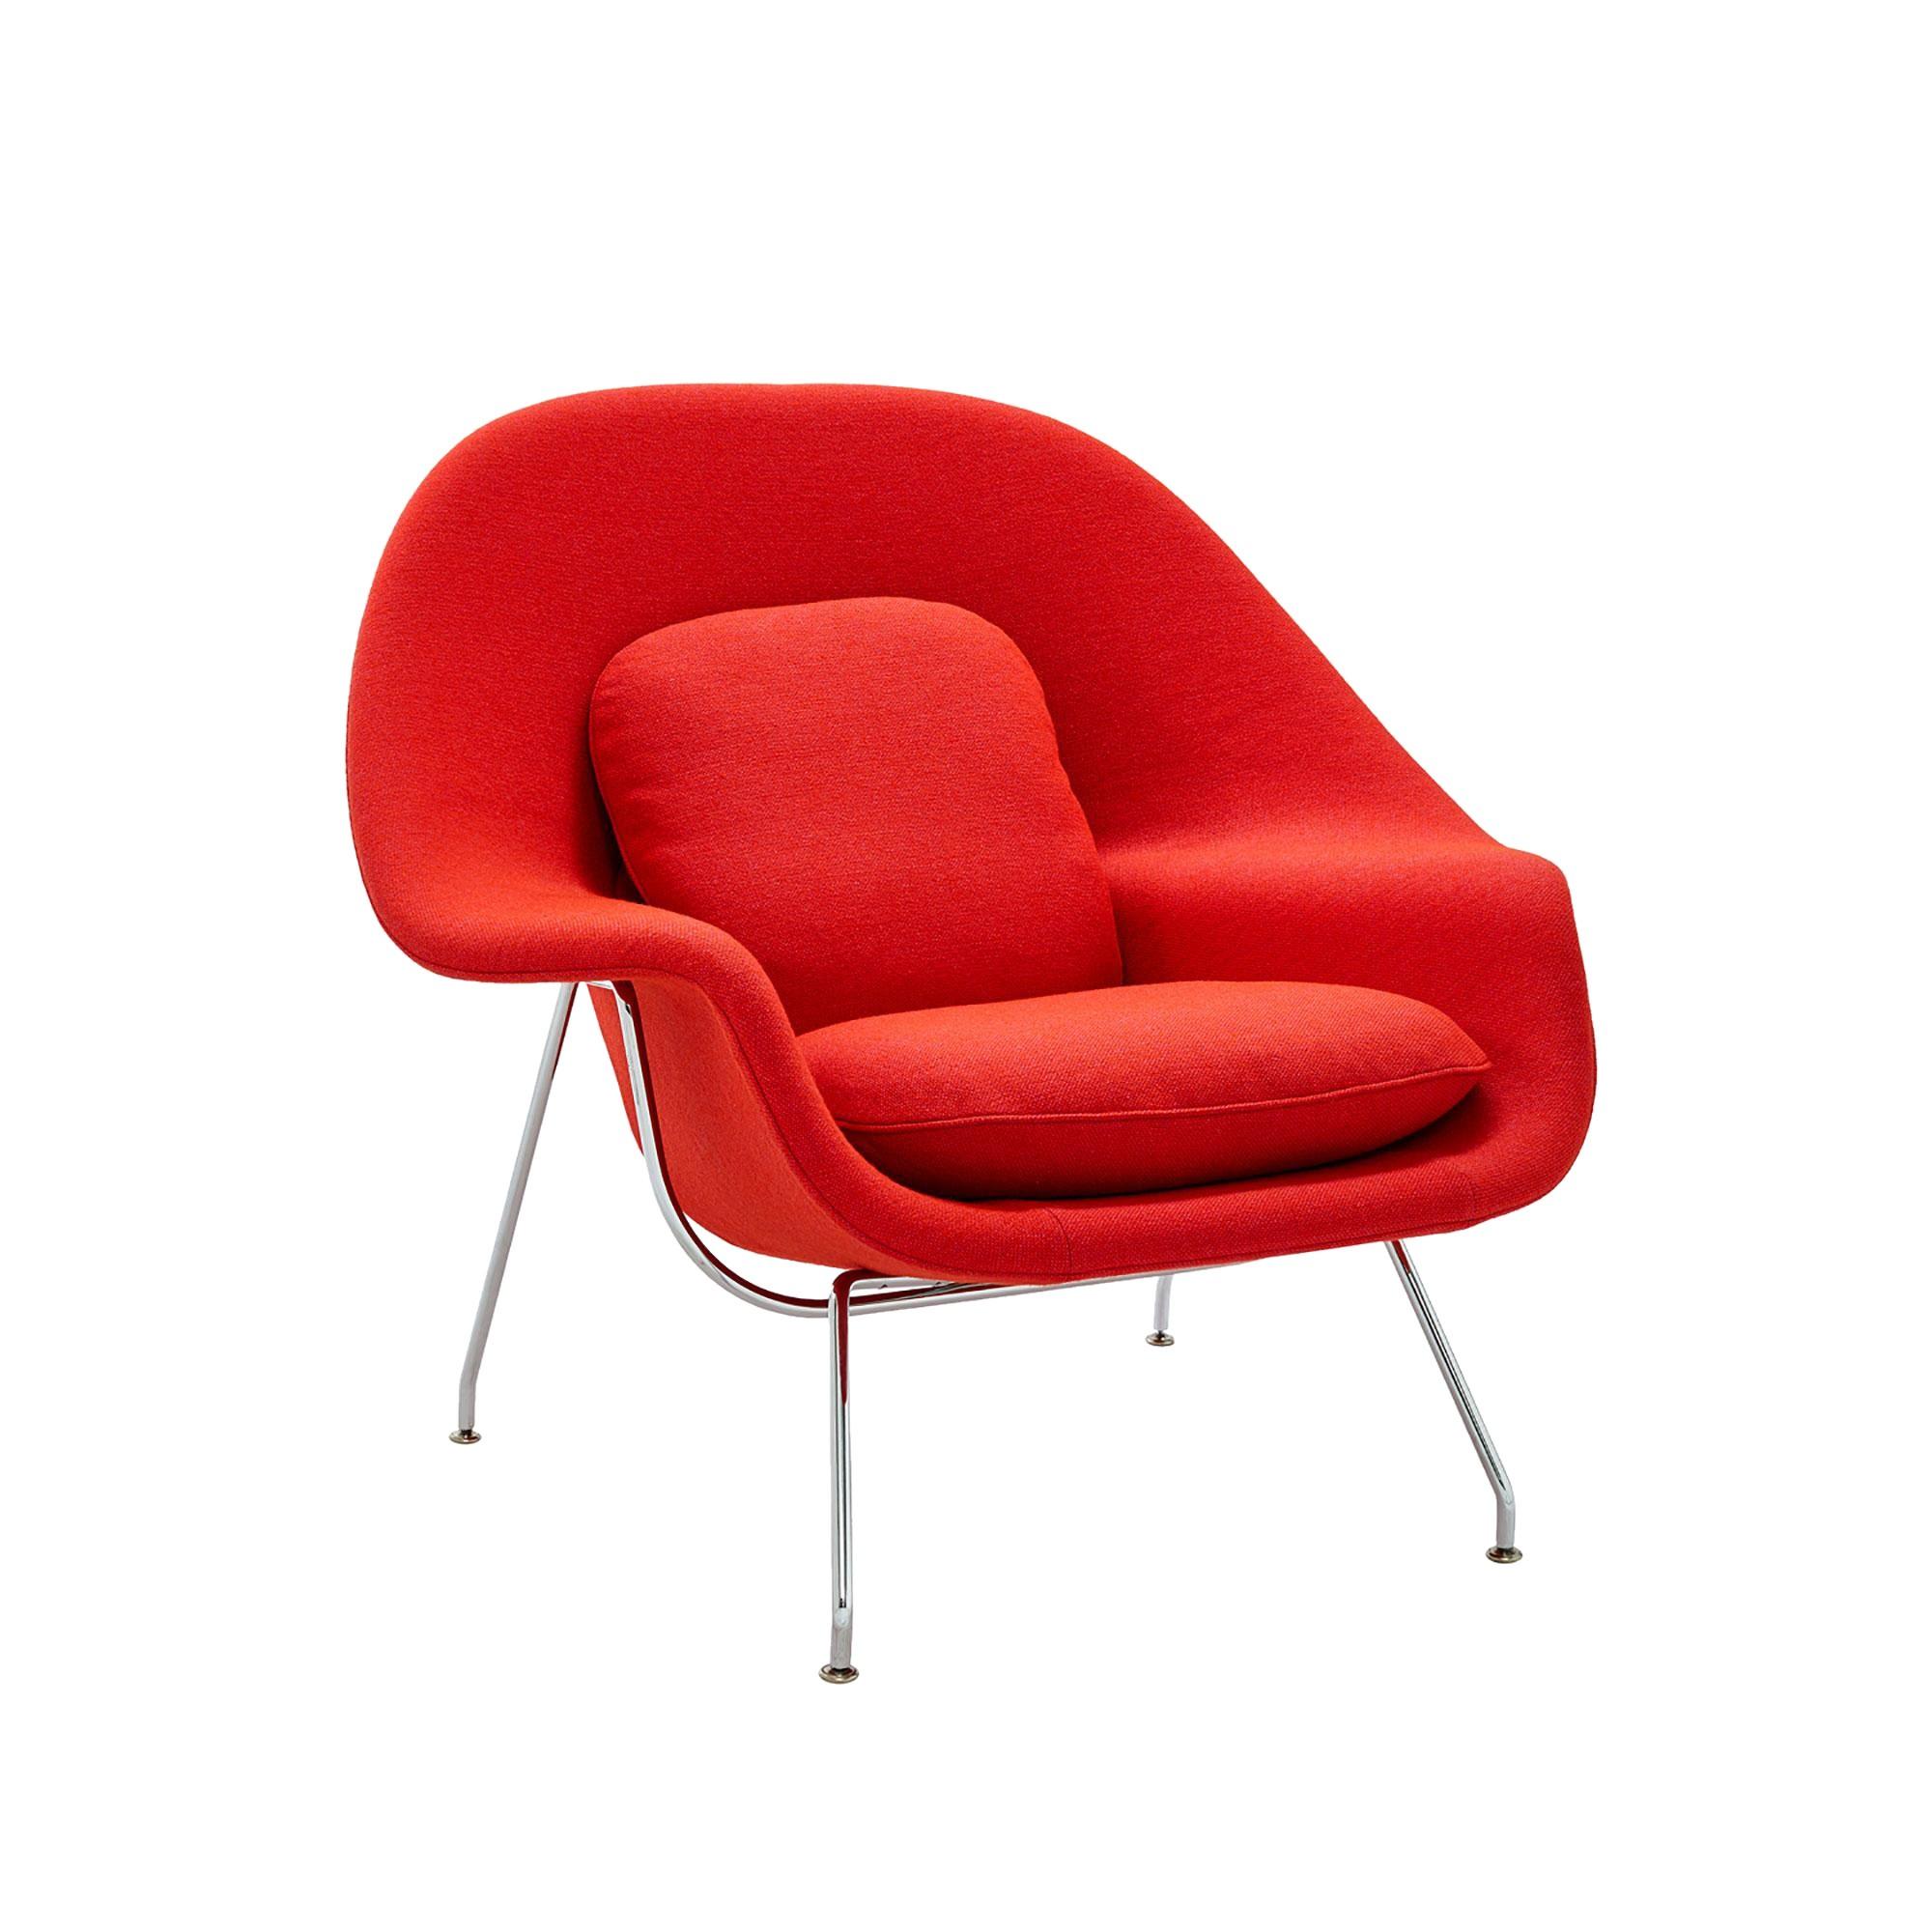 Knoll International   Womb Chair Relax Frame Chrome   Fuchsia Red/fabric  Hallingdal Fuchsia Red ...